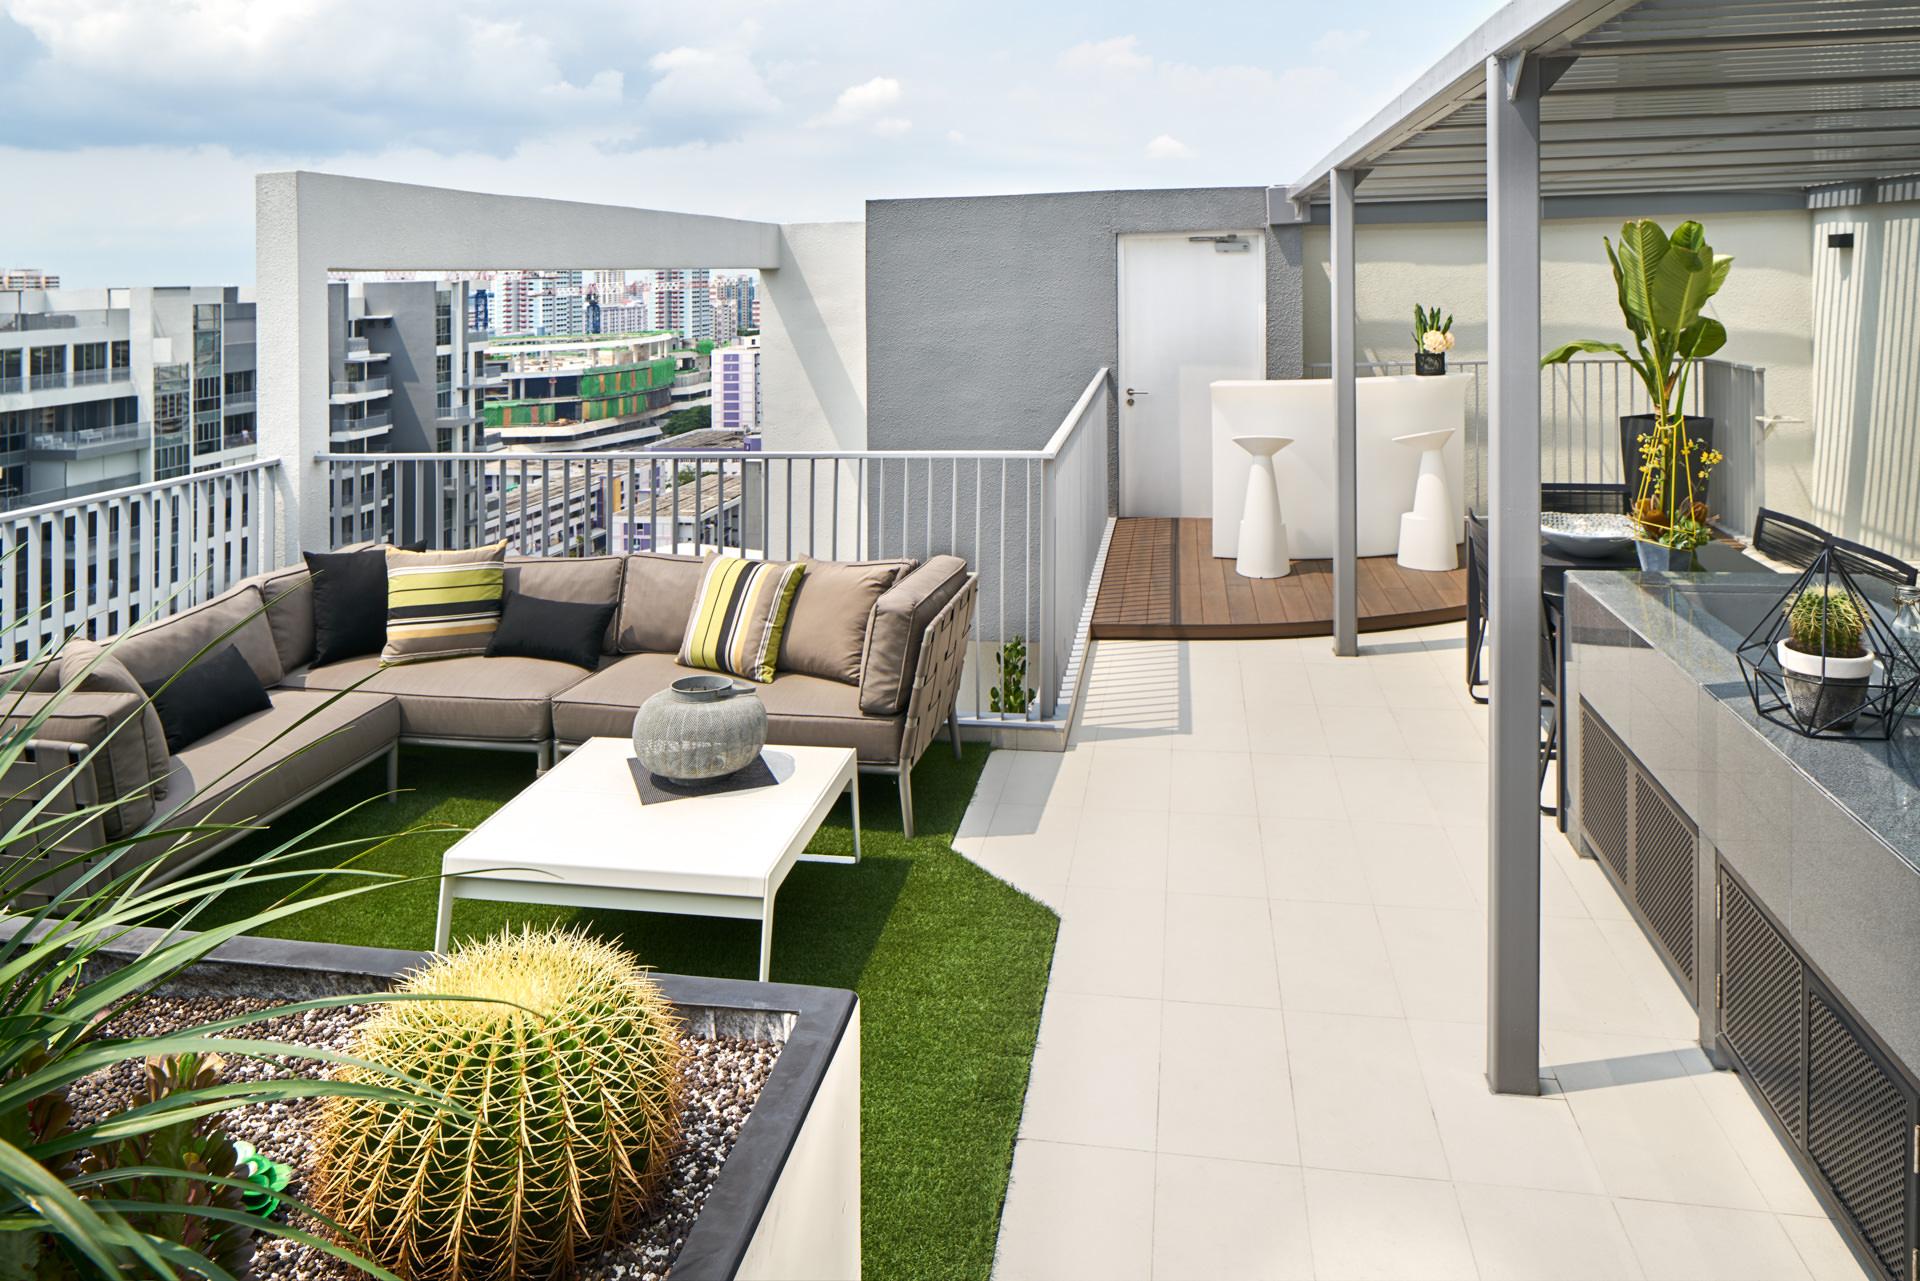 interior design photography at bedok residences in singapore